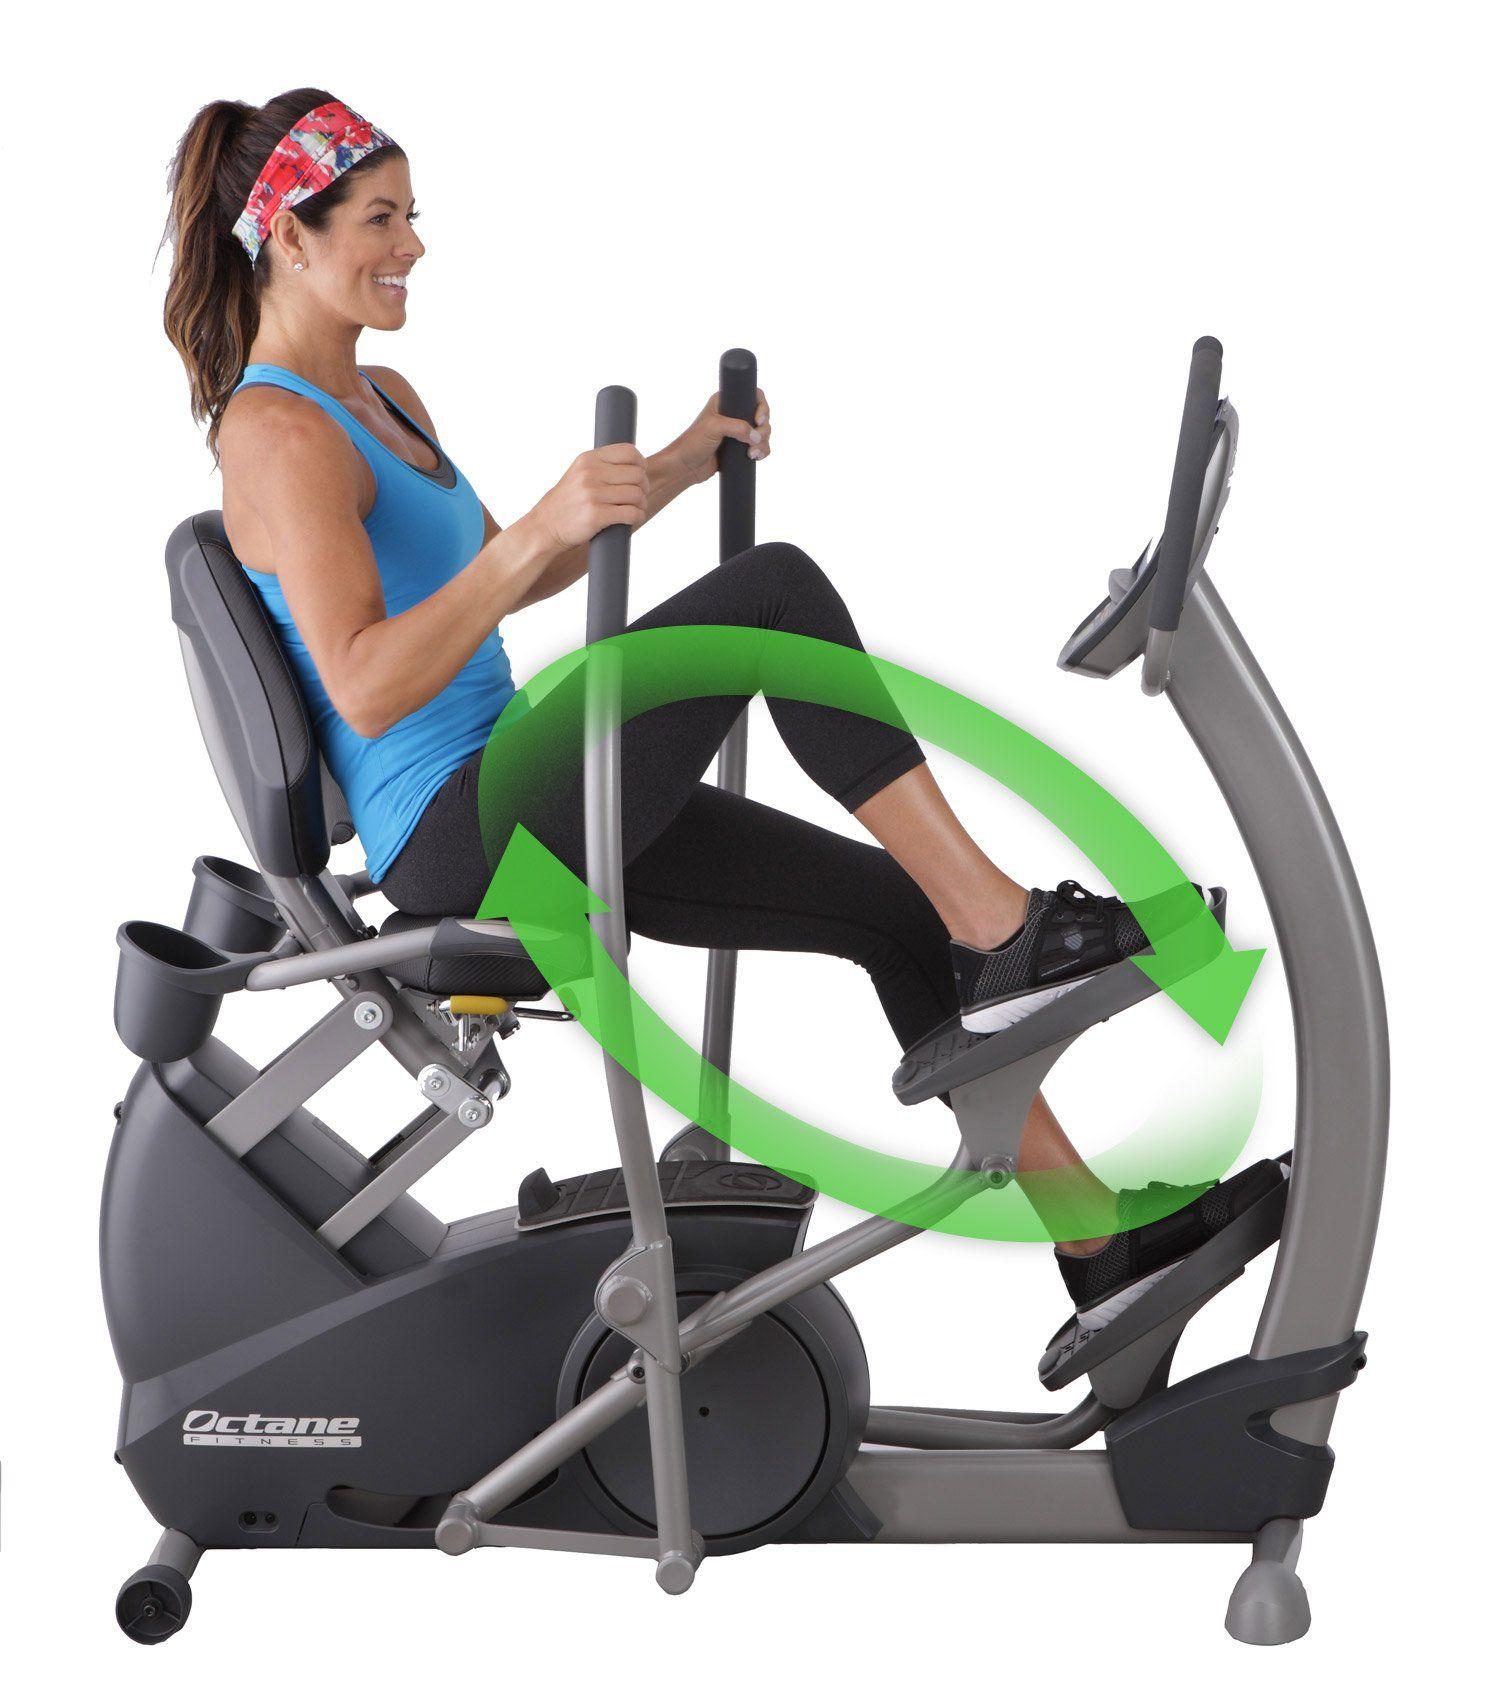 Octane Fitness xR4x side view